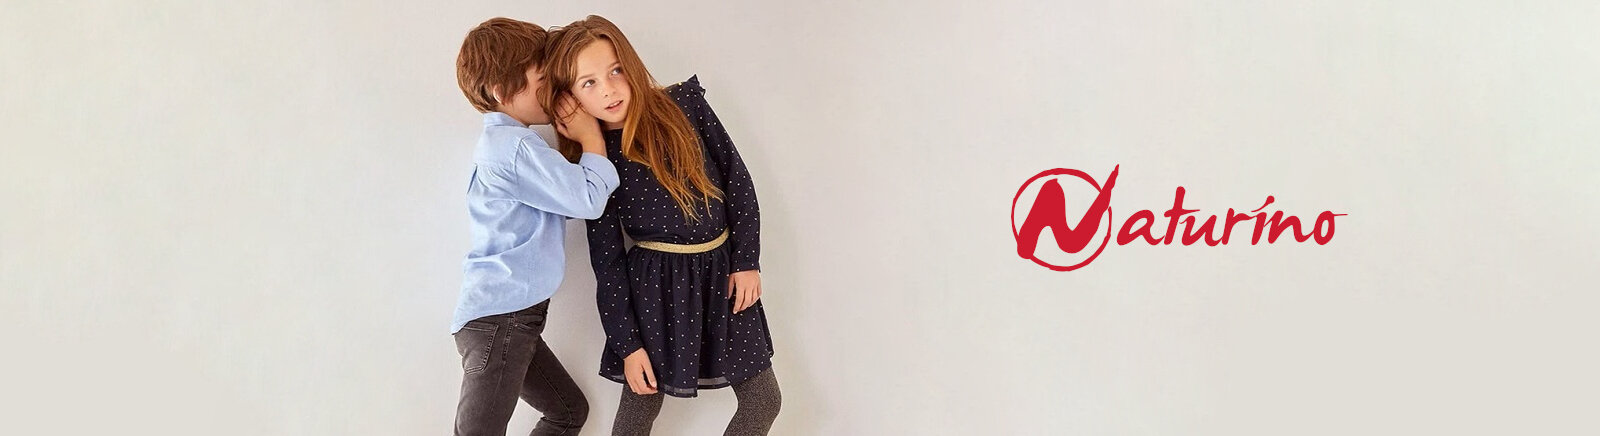 Prange: Naturino/Falcotto Kinderschuhe online shoppen